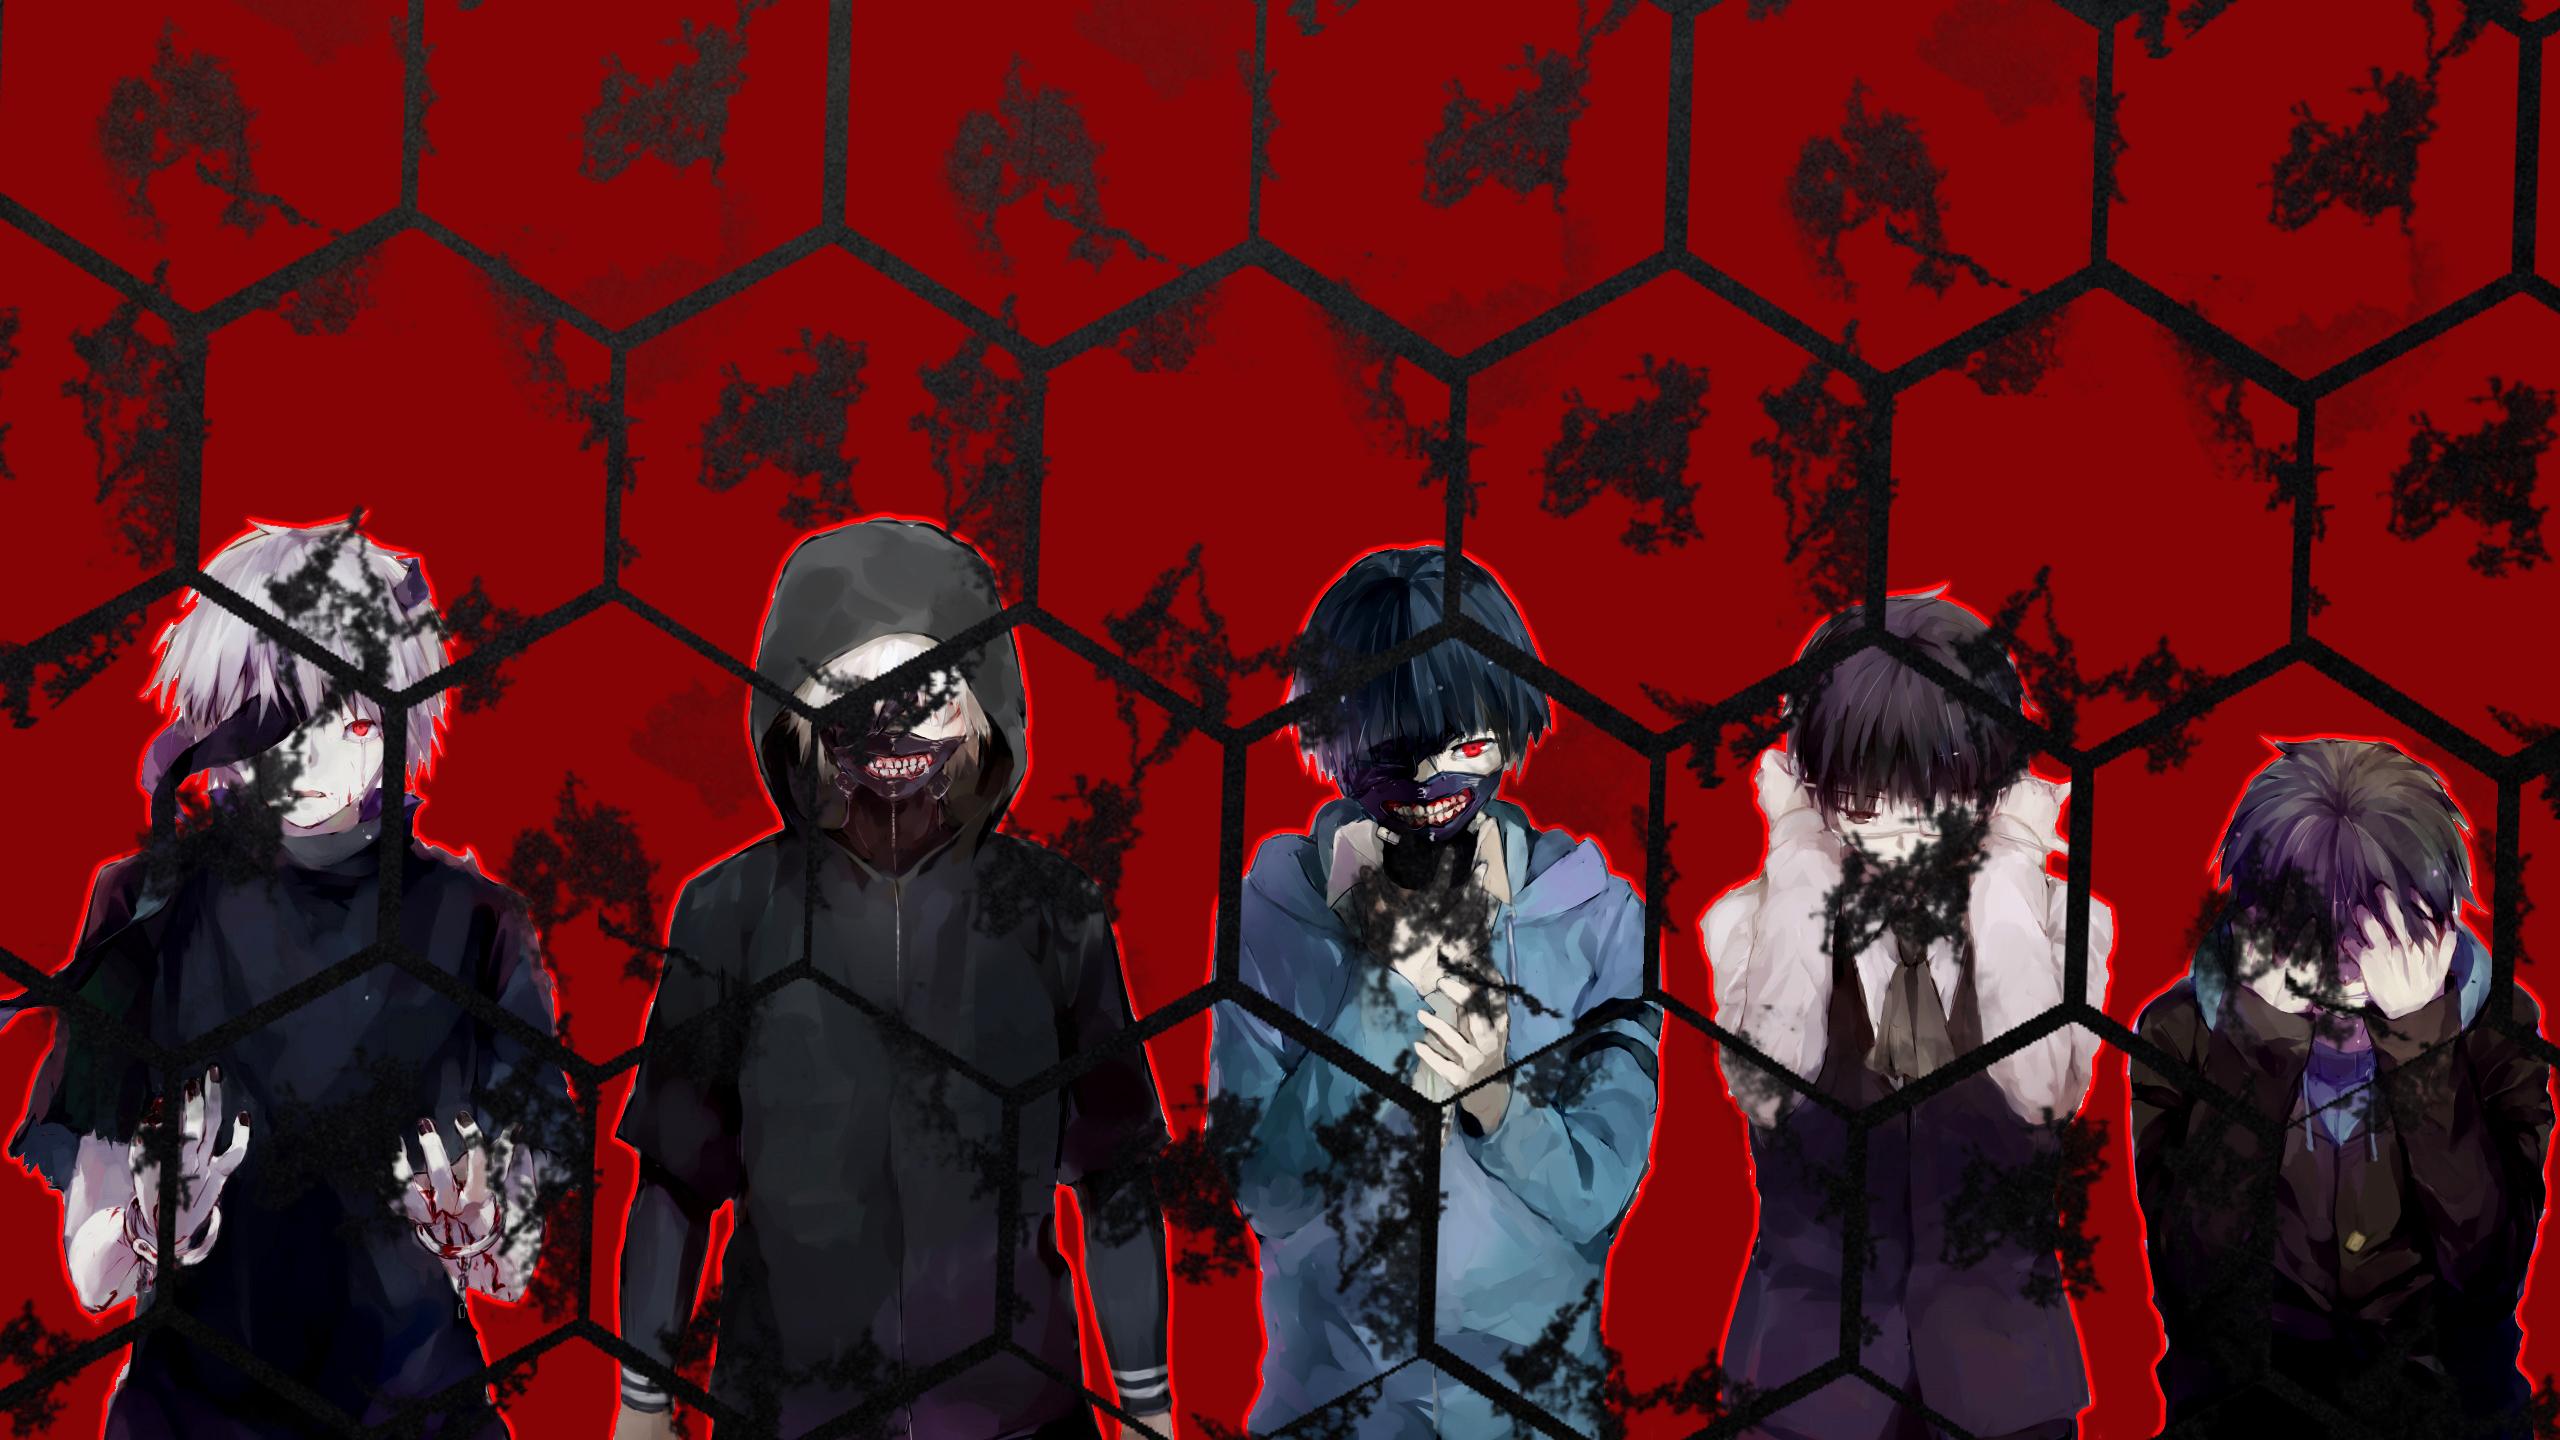 Tokyo Ghoulre Fondo De Pantalla Hd Fondo De Escritorio